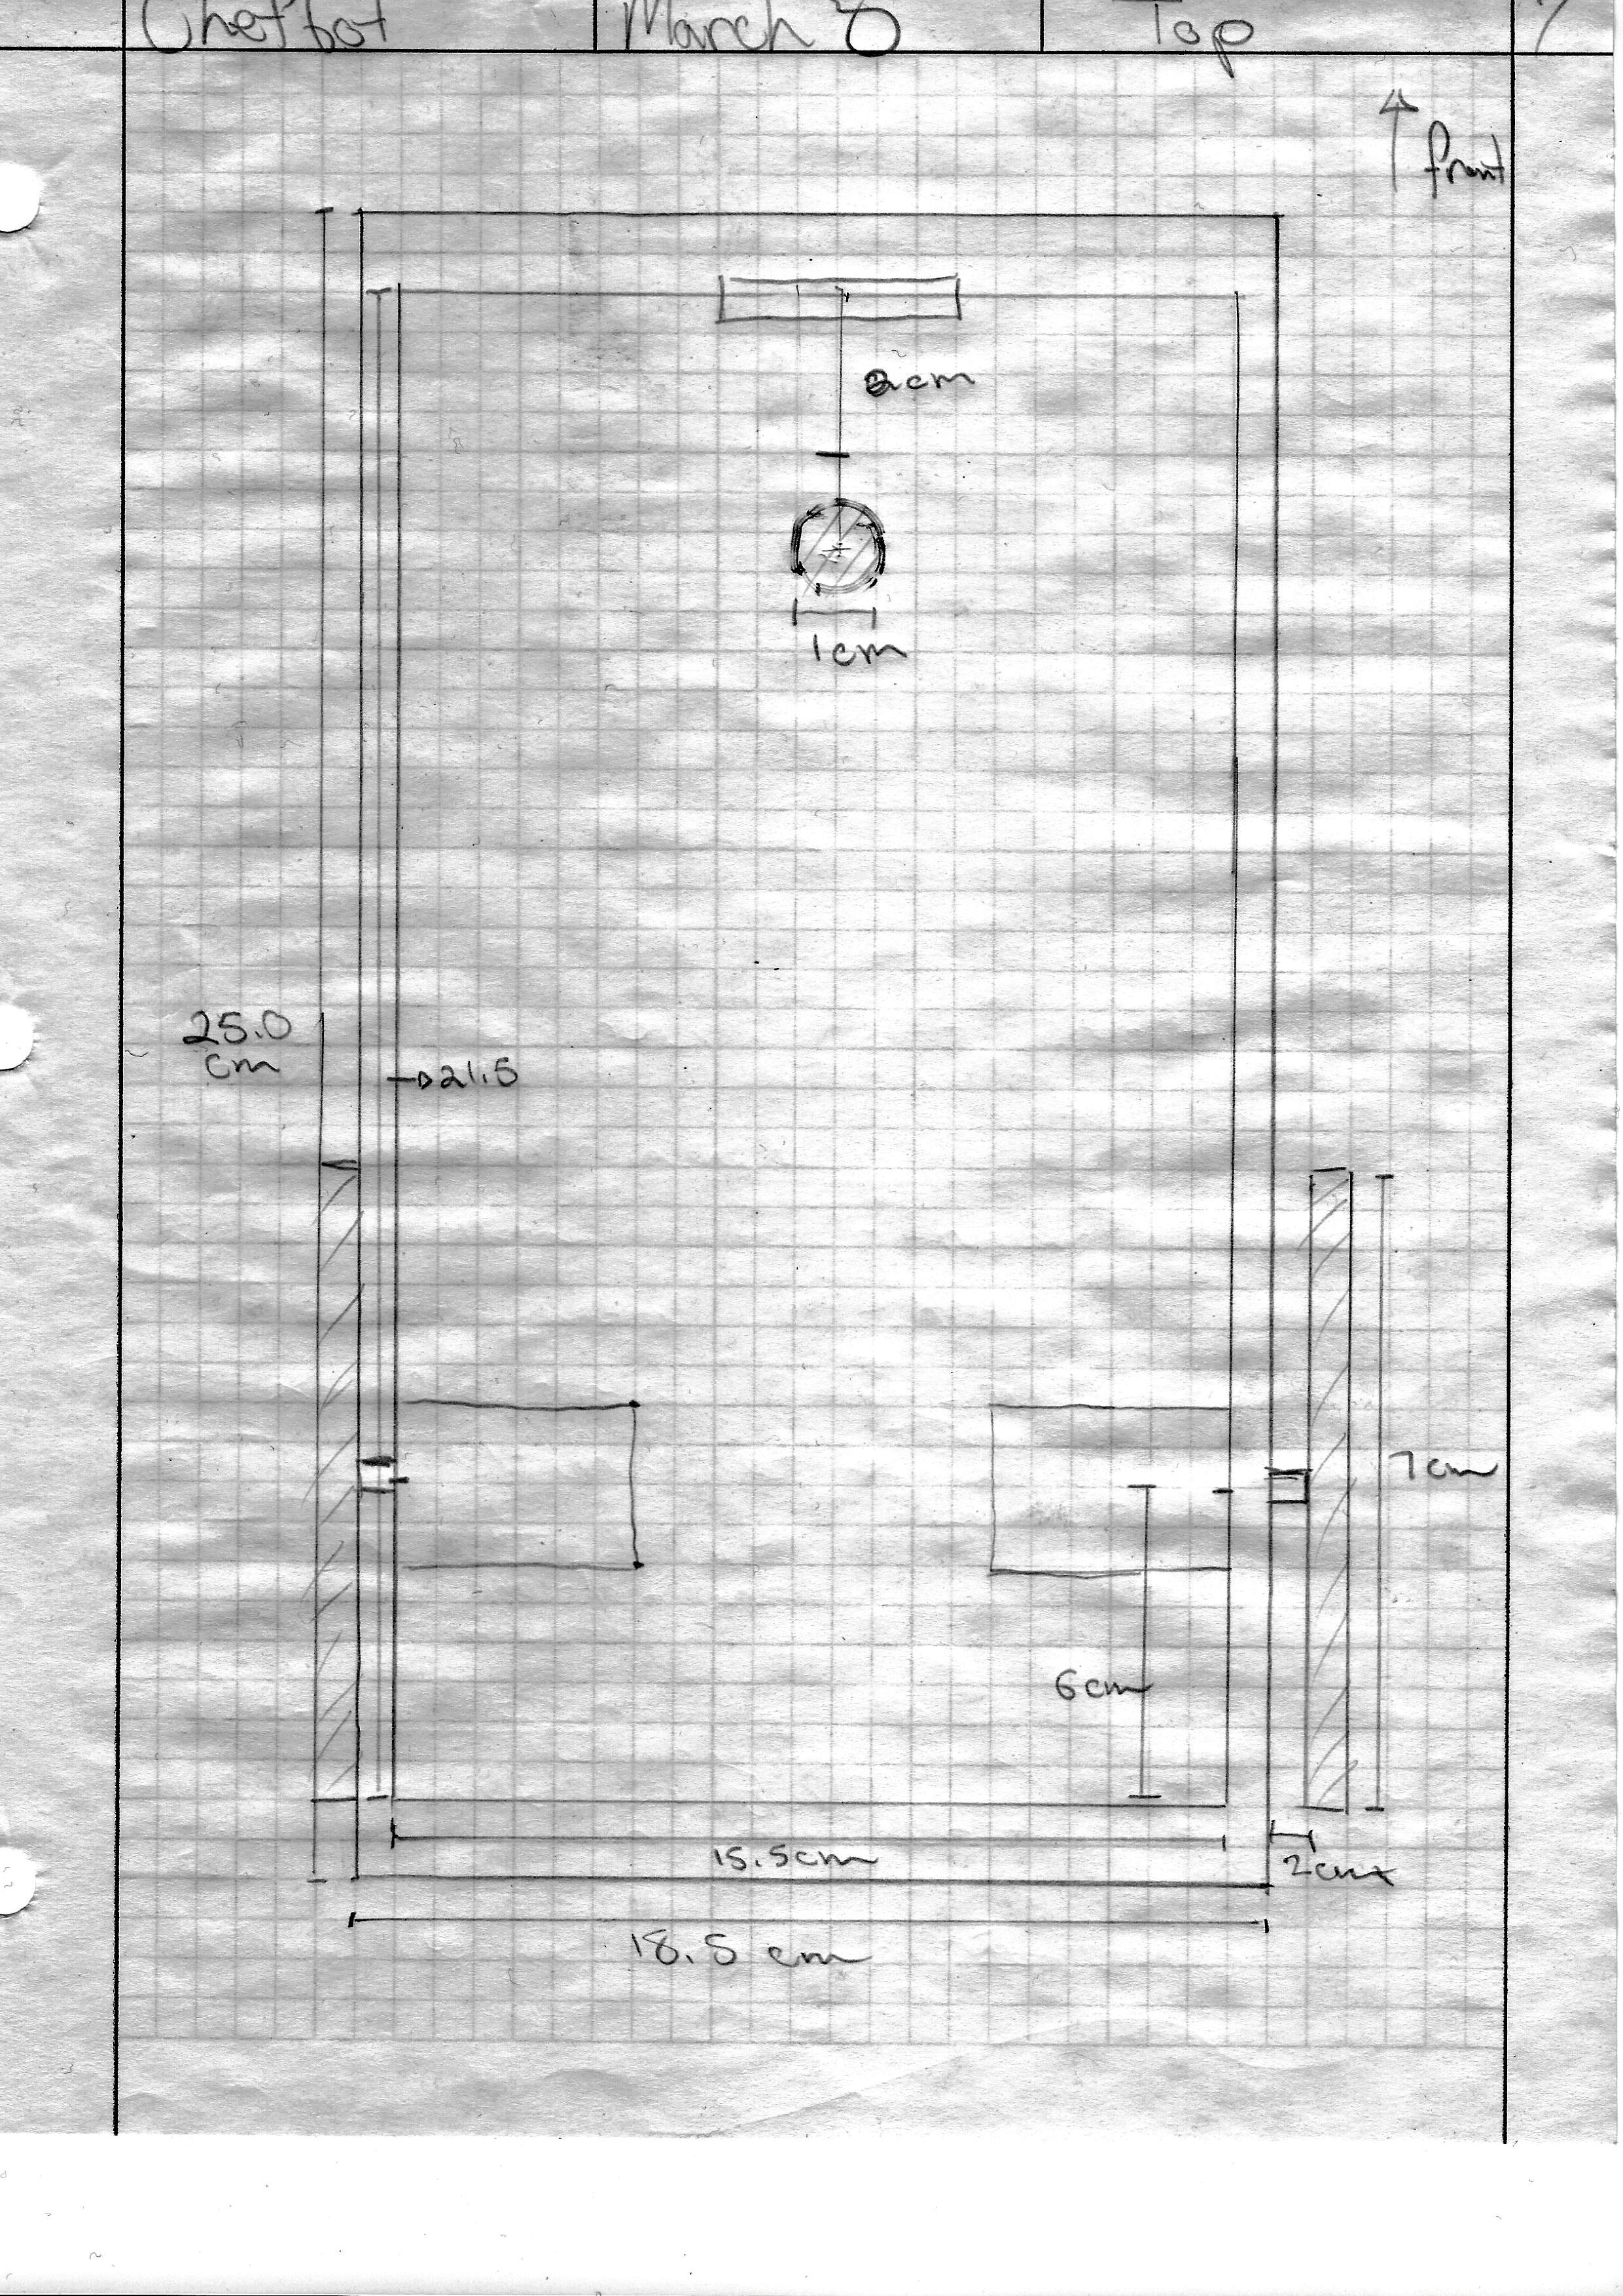 Drawing of Chefbot - 2